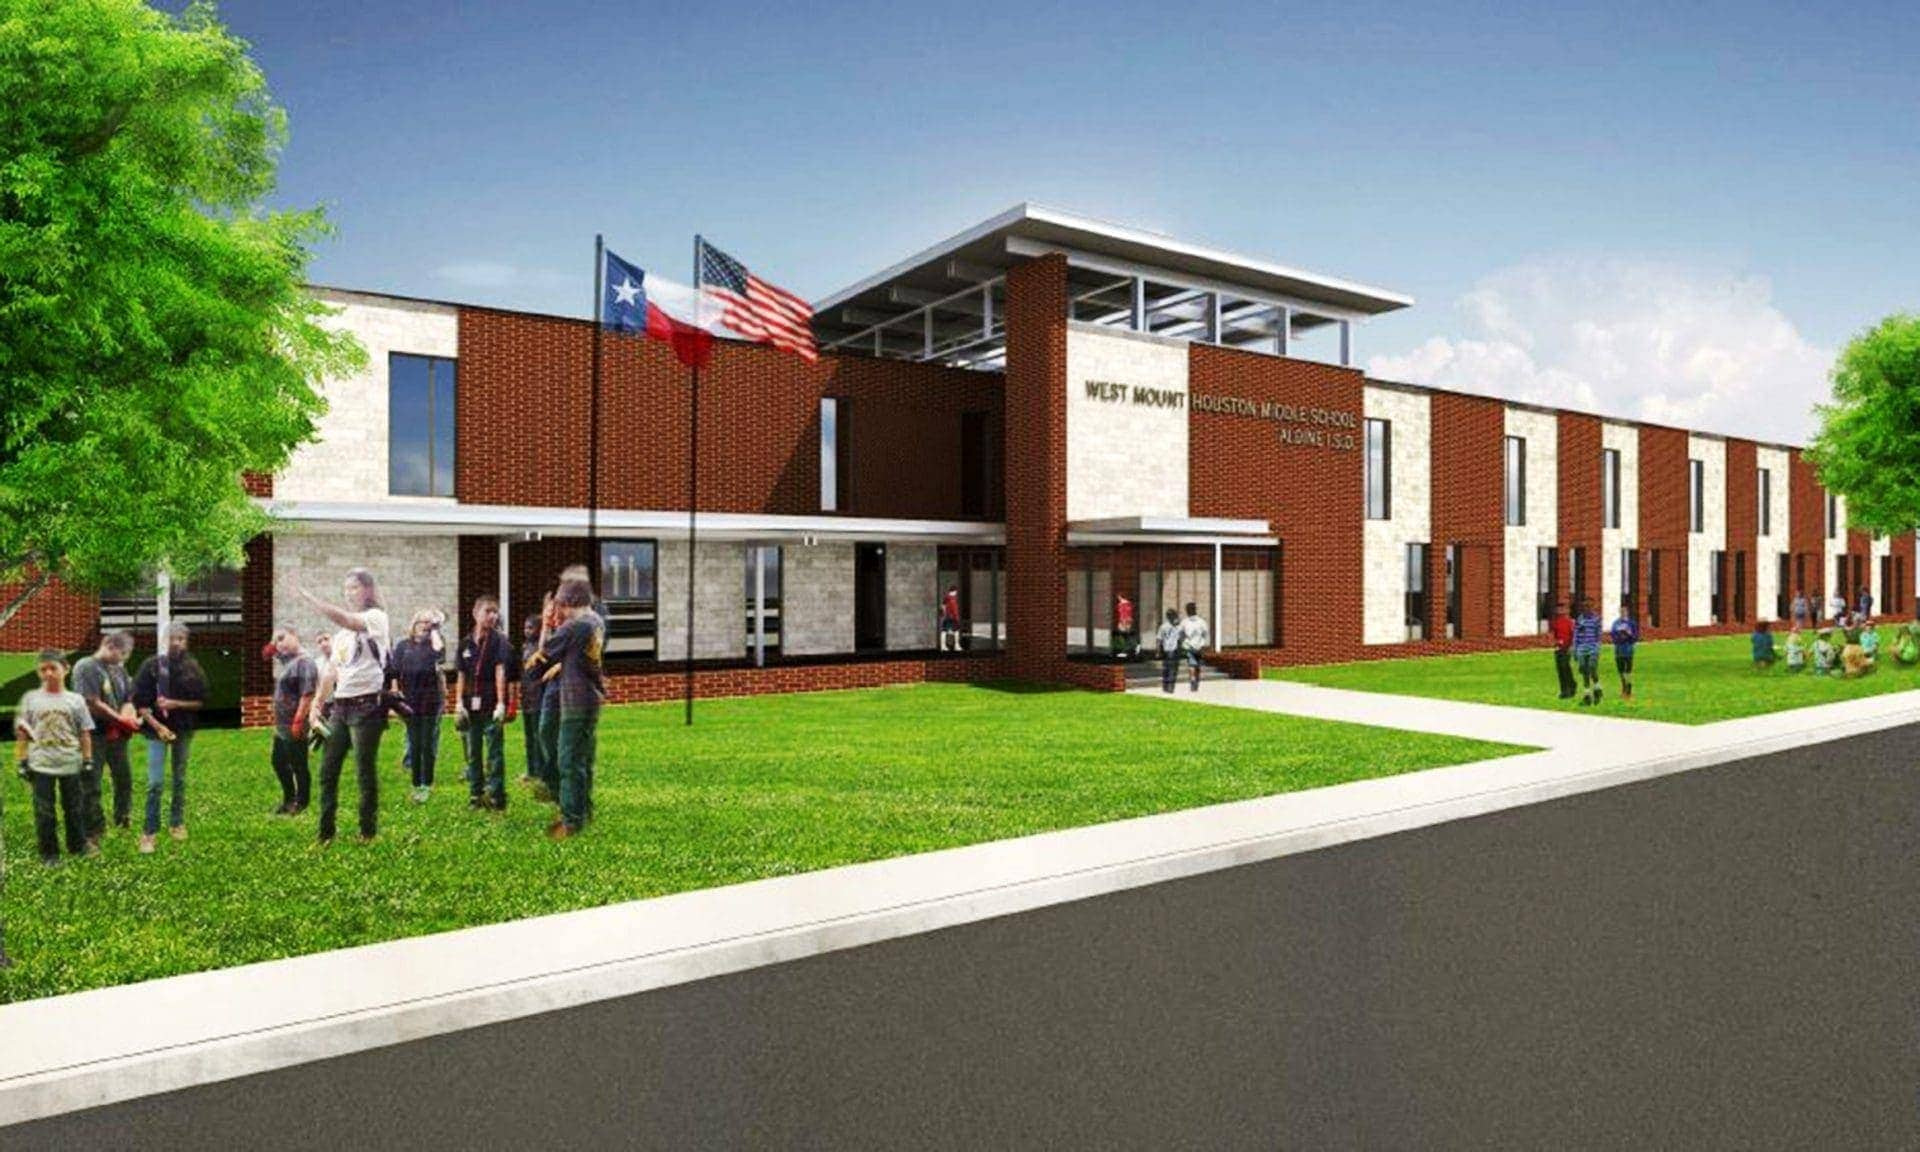 Ferrovial will build schools in Texas